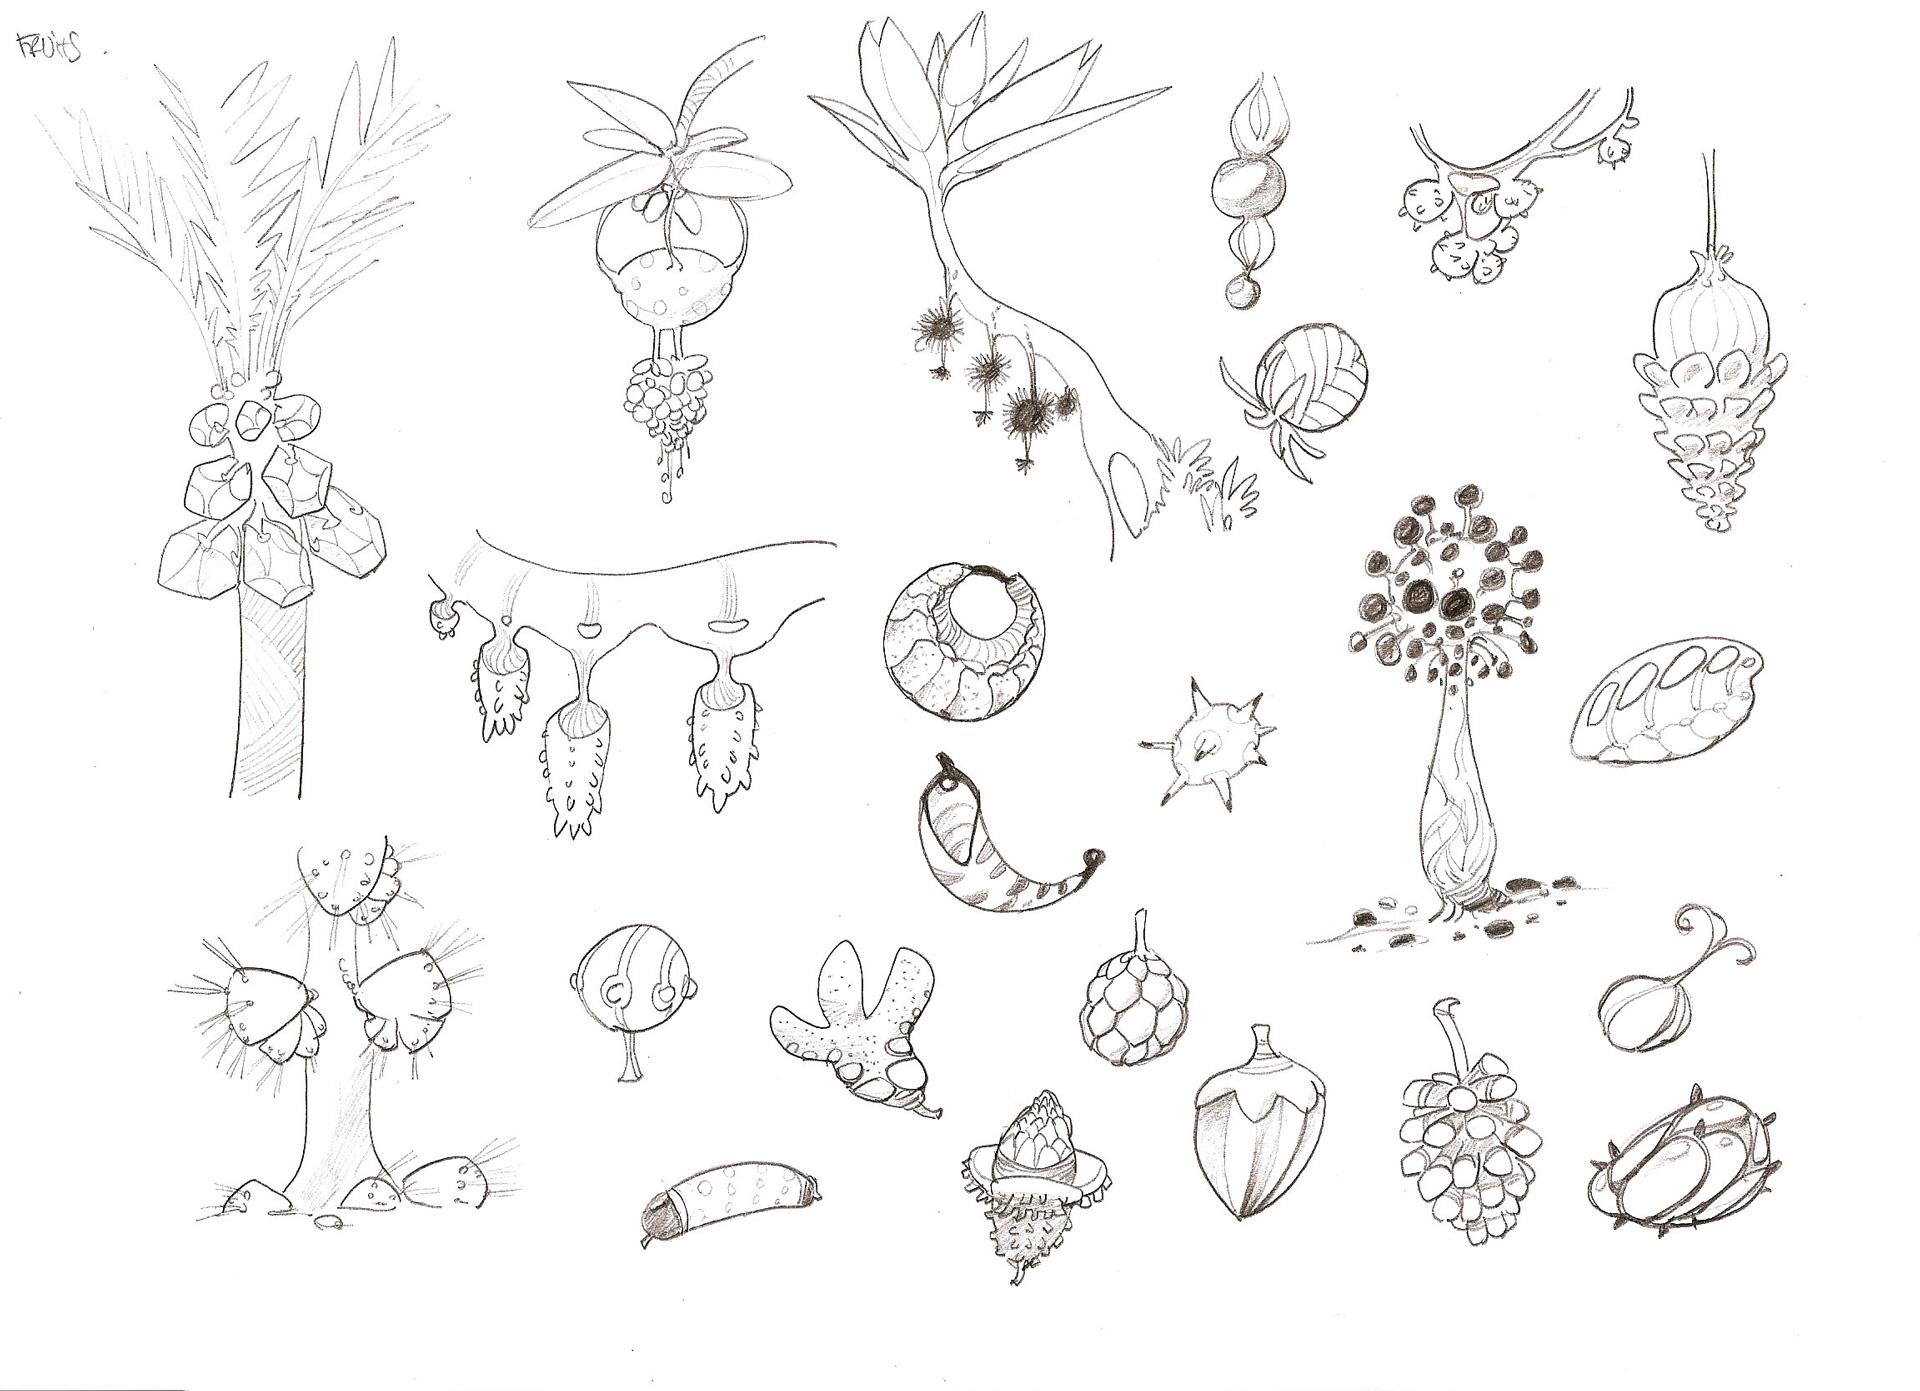 fruits02.jpg